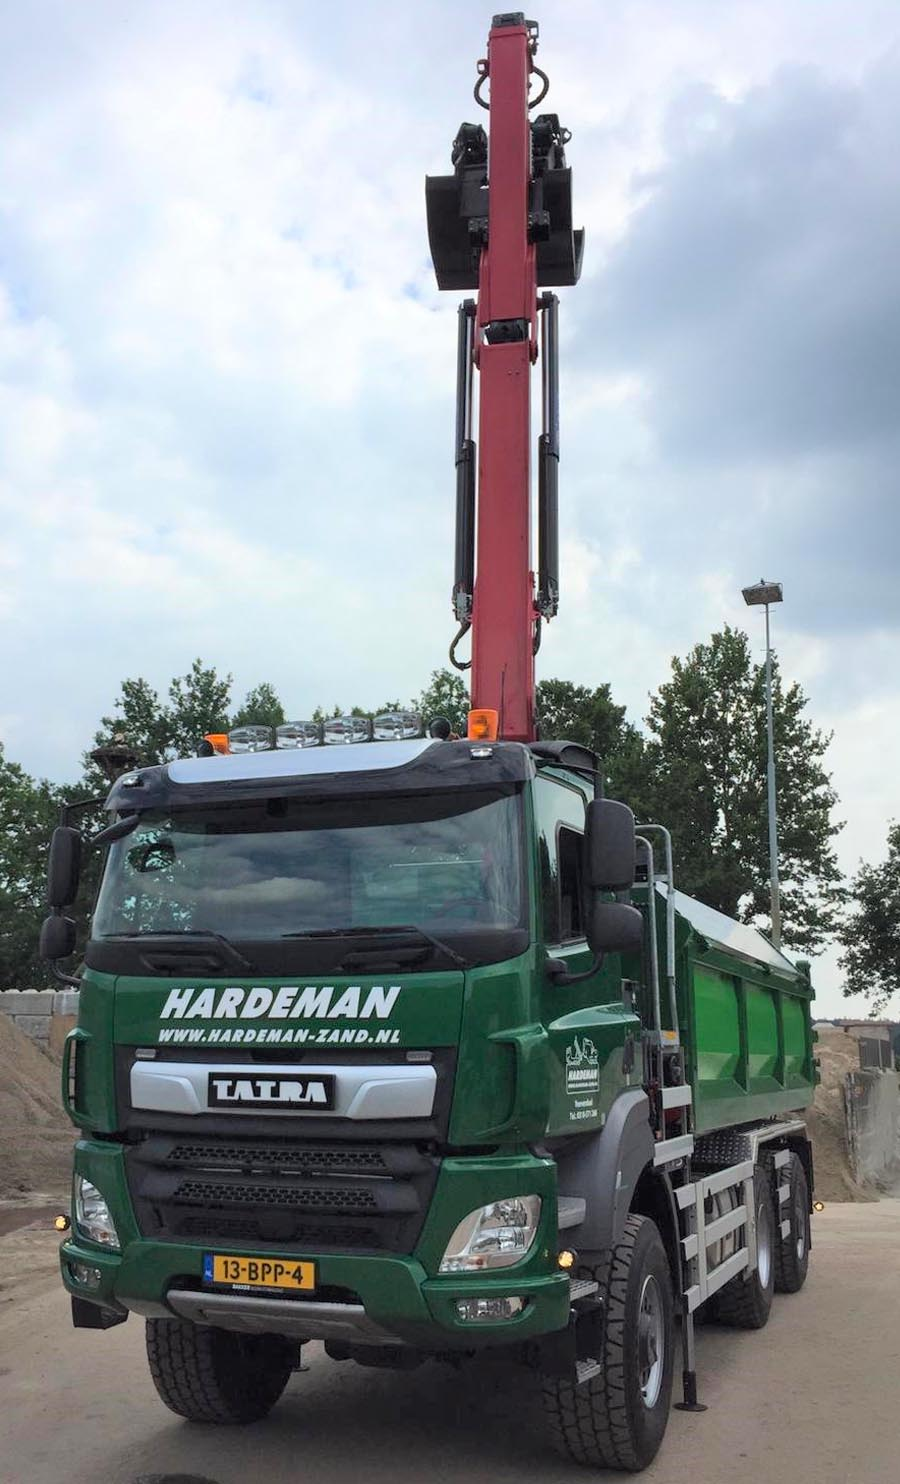 TATRA-Hardeman-5